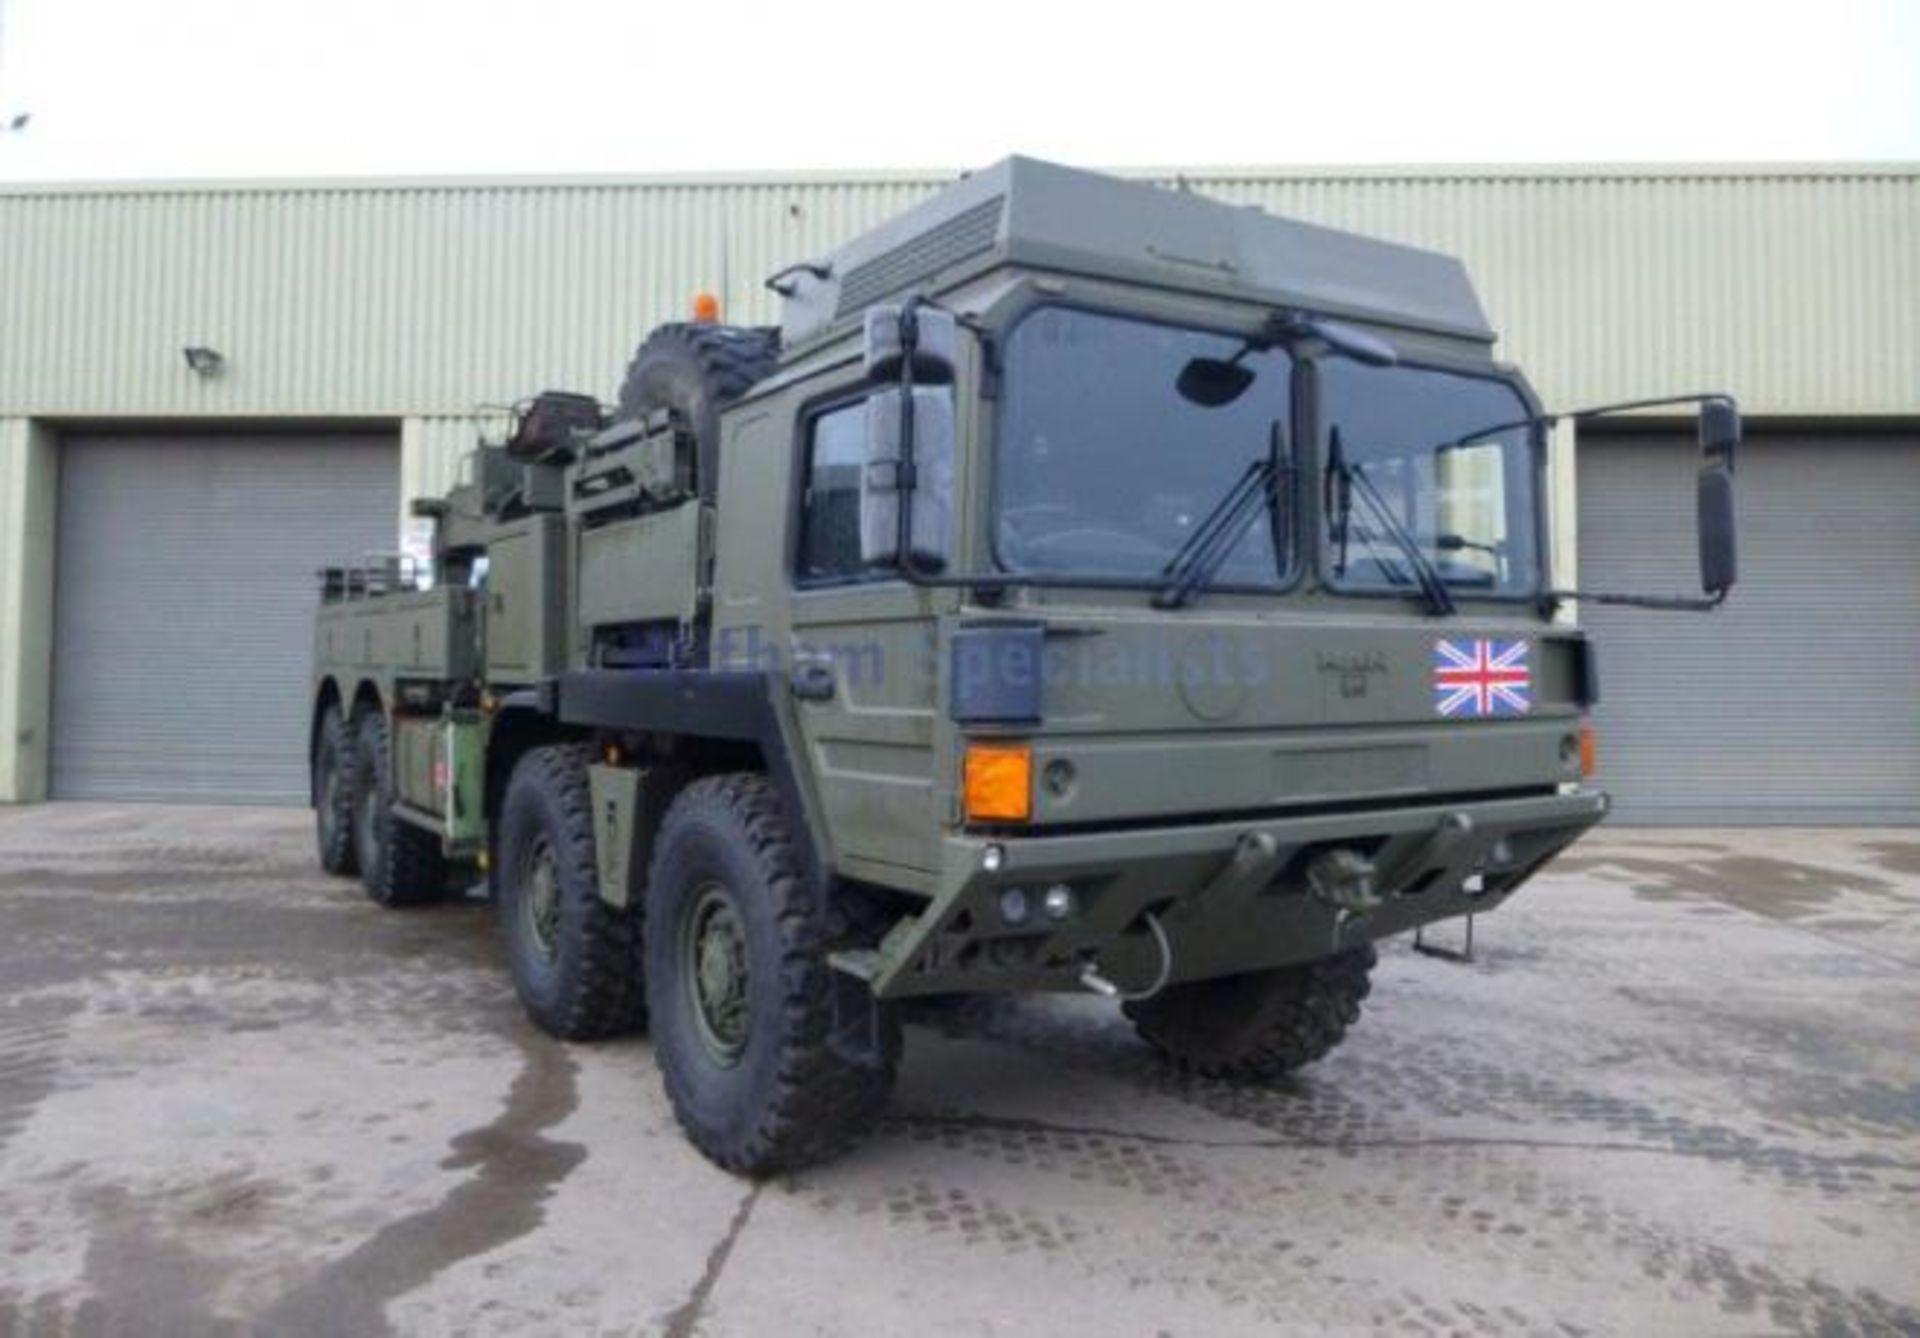 Lot 7 - MAN SX45 32.430 RHD 8x8 Recovery Truck ONLY 14,720km!